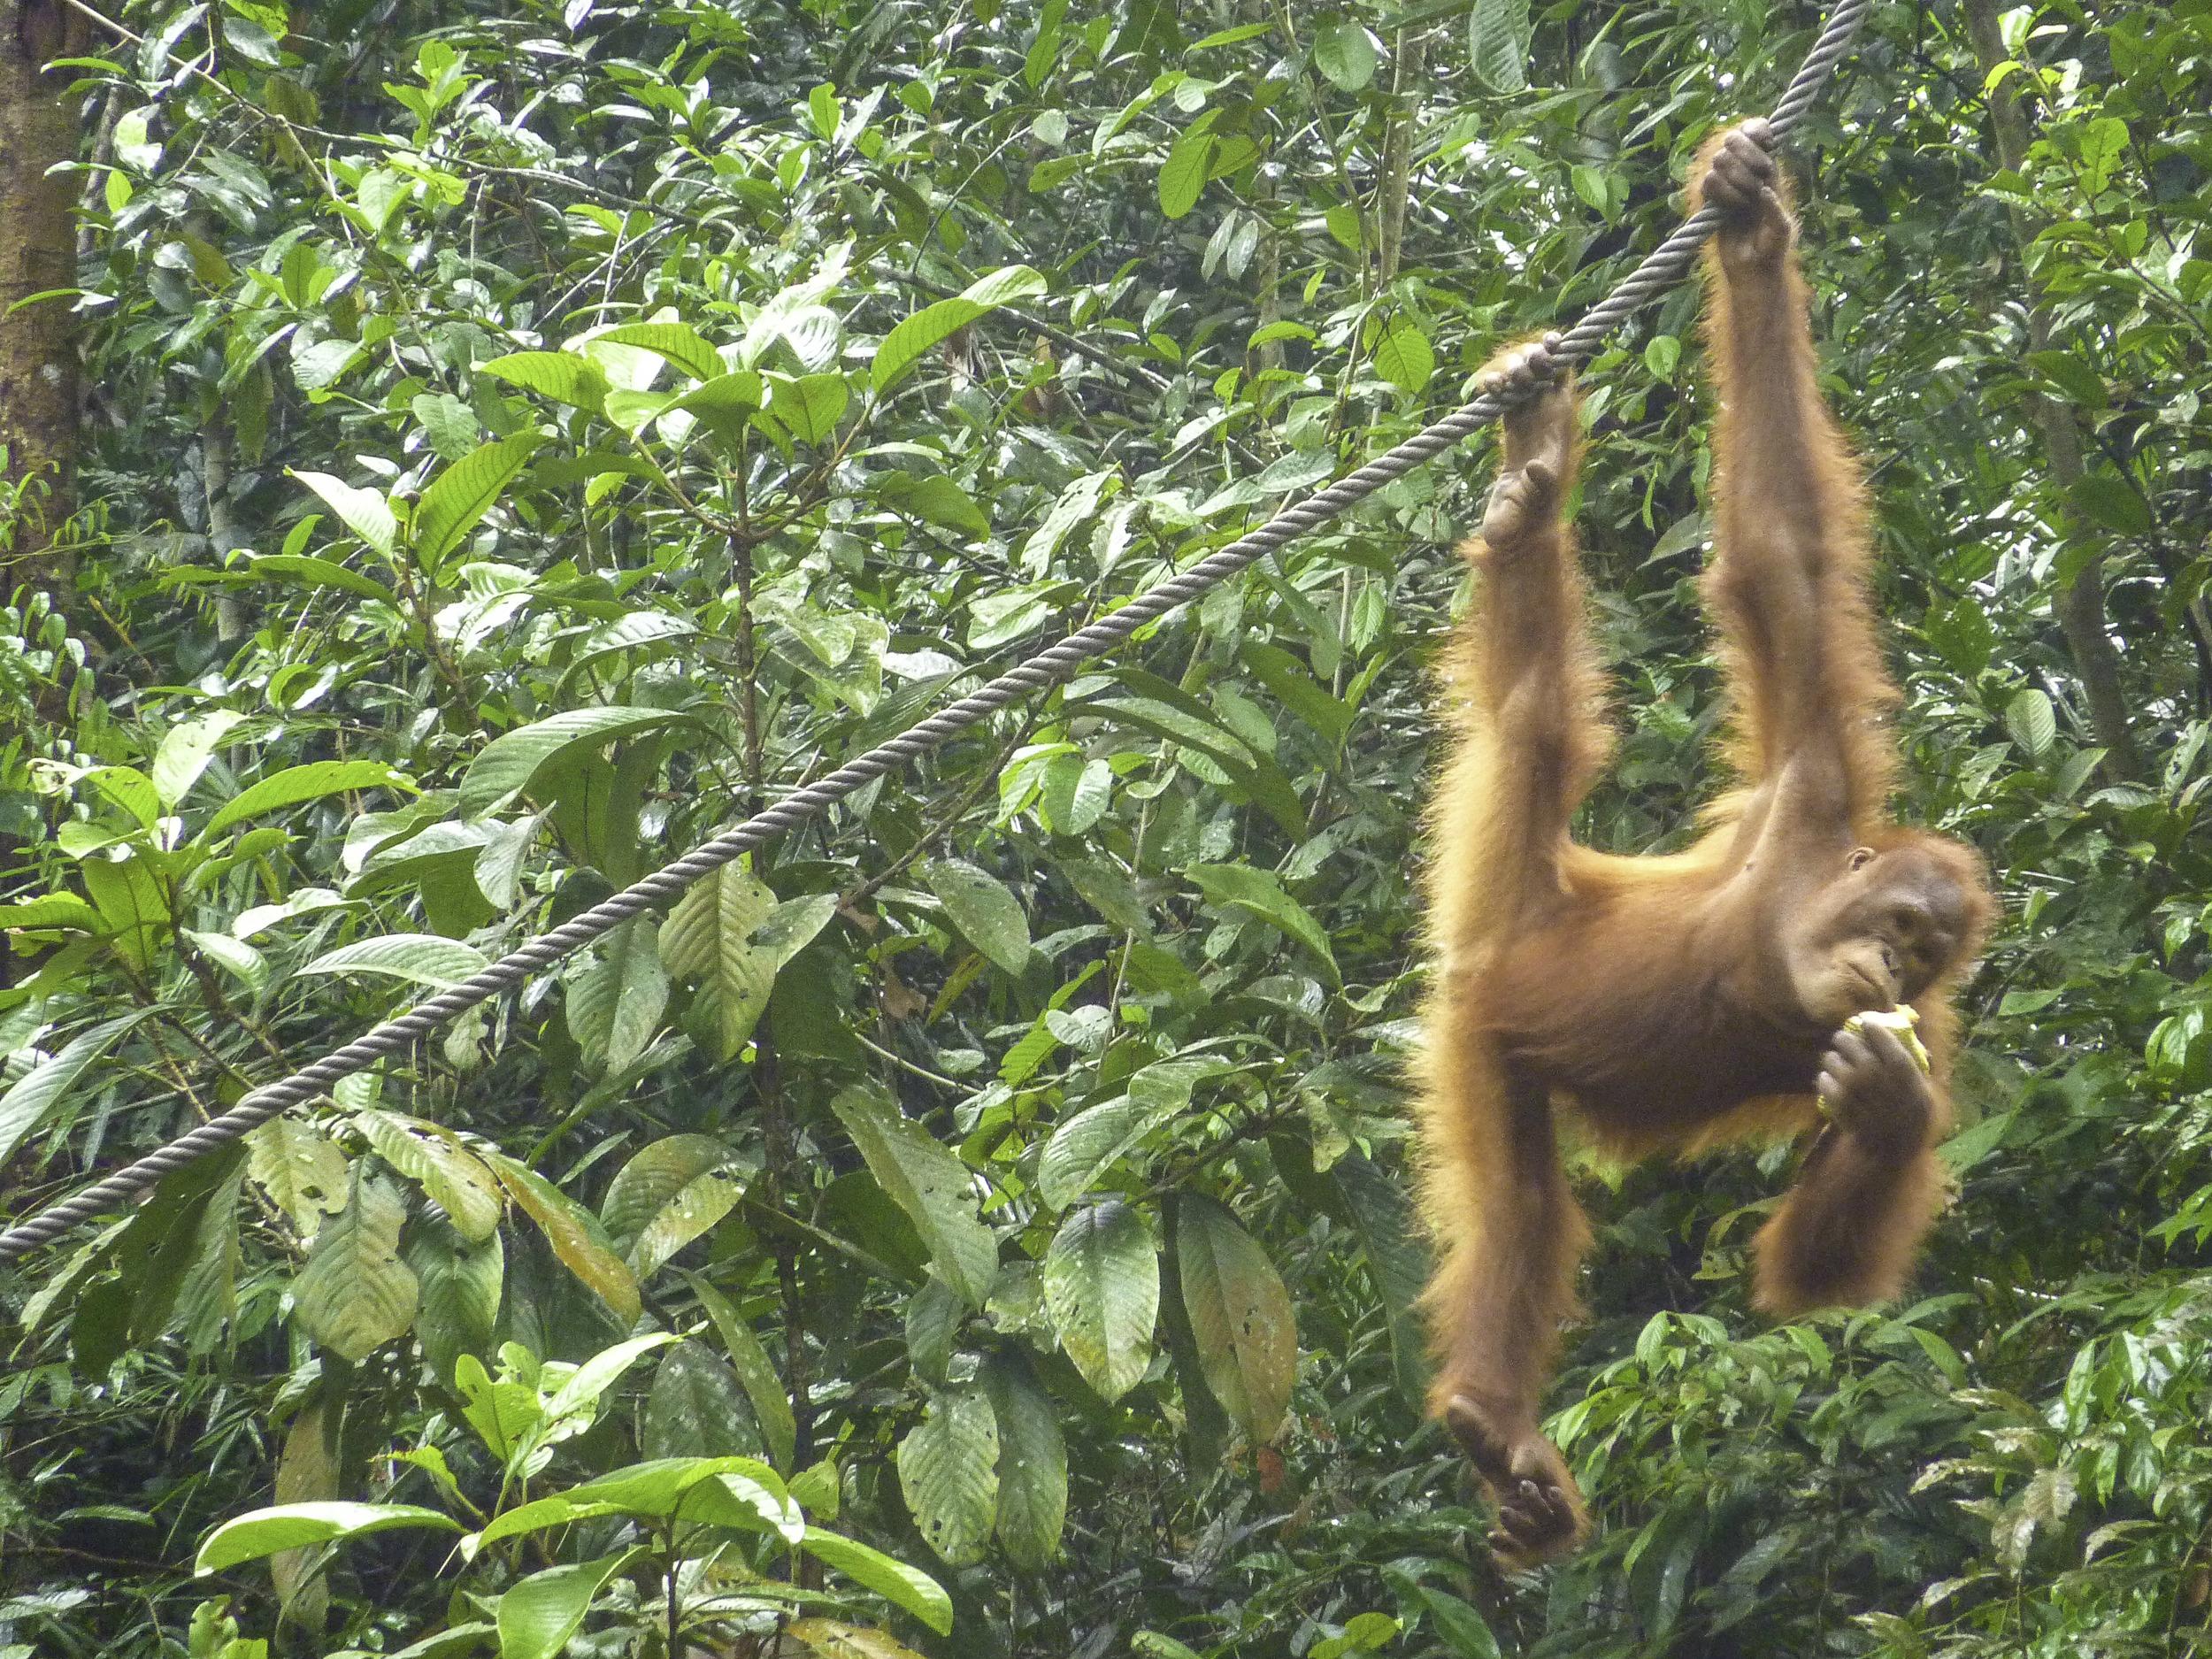 Orangatang Borneo thisworldexists this world exists monkey tom jessett